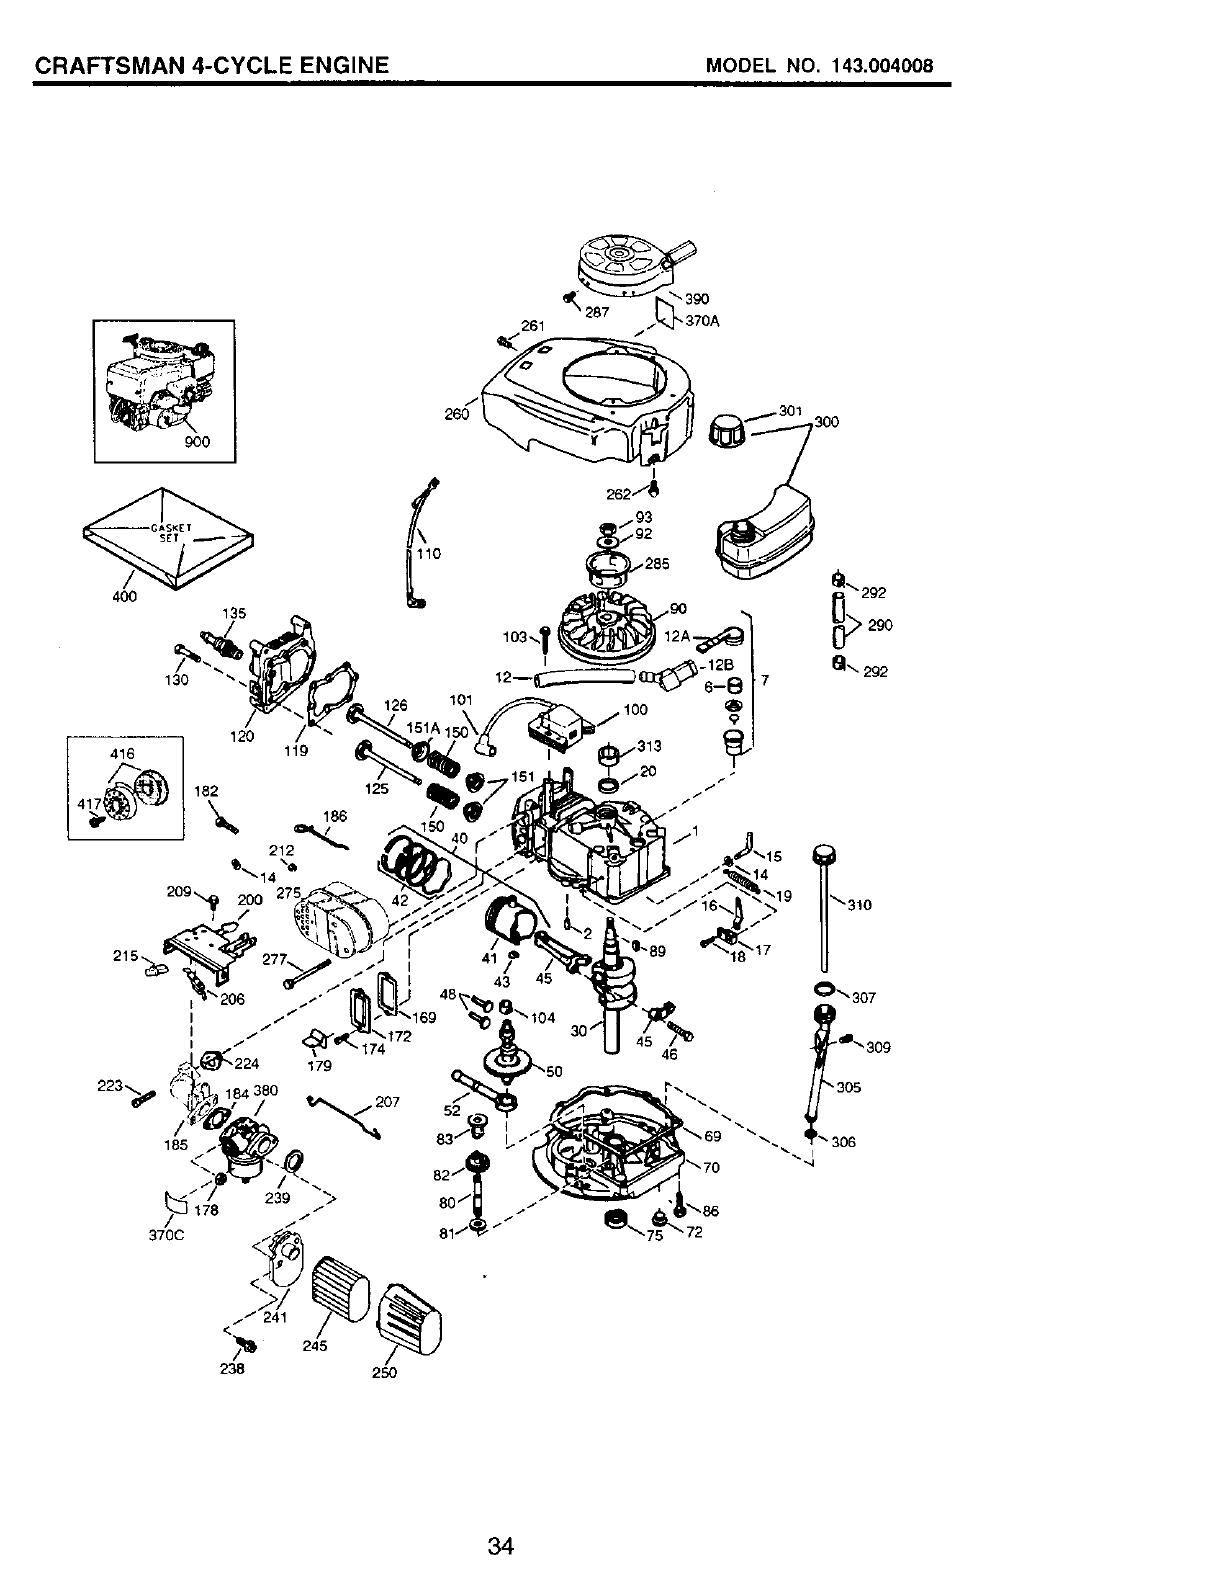 Craftsman 917.77341 CRAFTSMAN 4-CYCLE ENGINE MODEL NO. 143